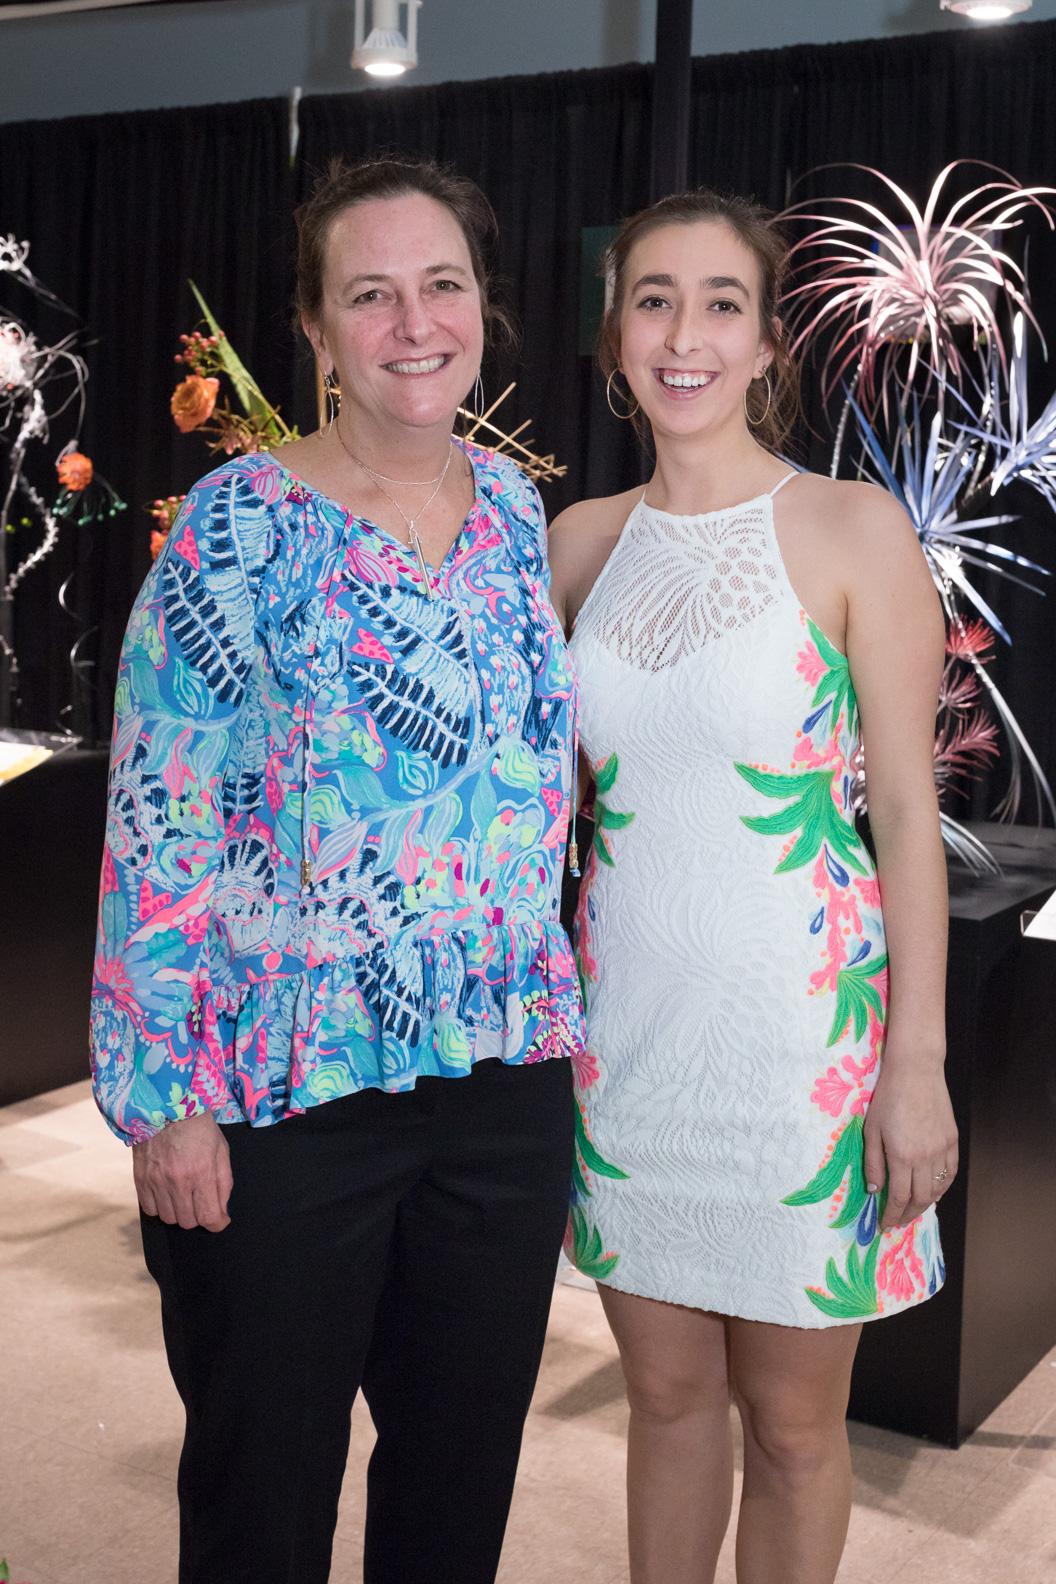 Emily and Sarah Morena